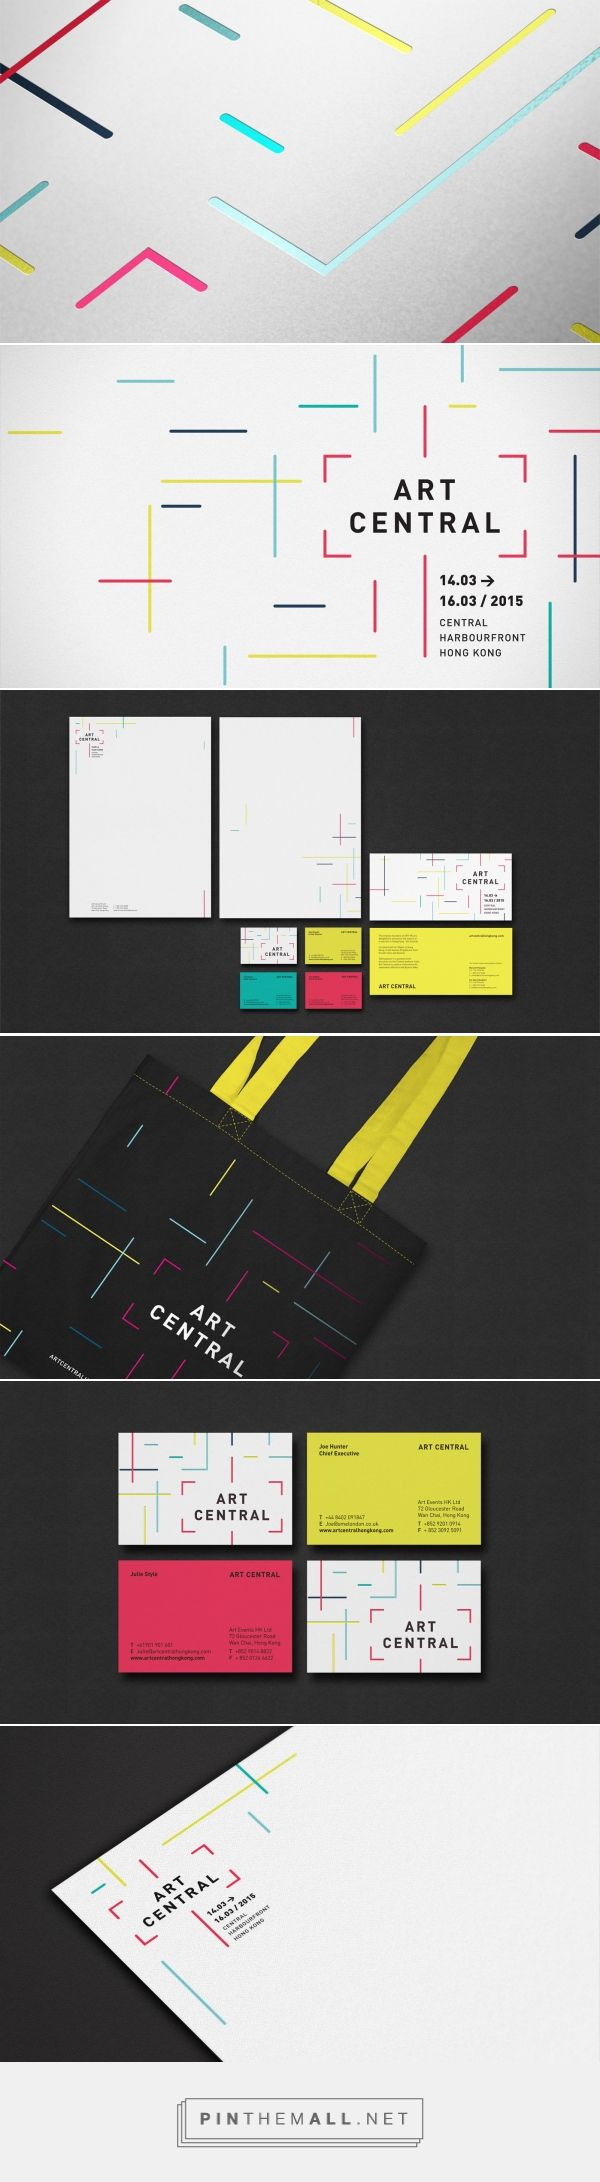 Art Central Branding by The Plant | Fivestar Branding – Design and Branding Agency & Inspiration Gallery